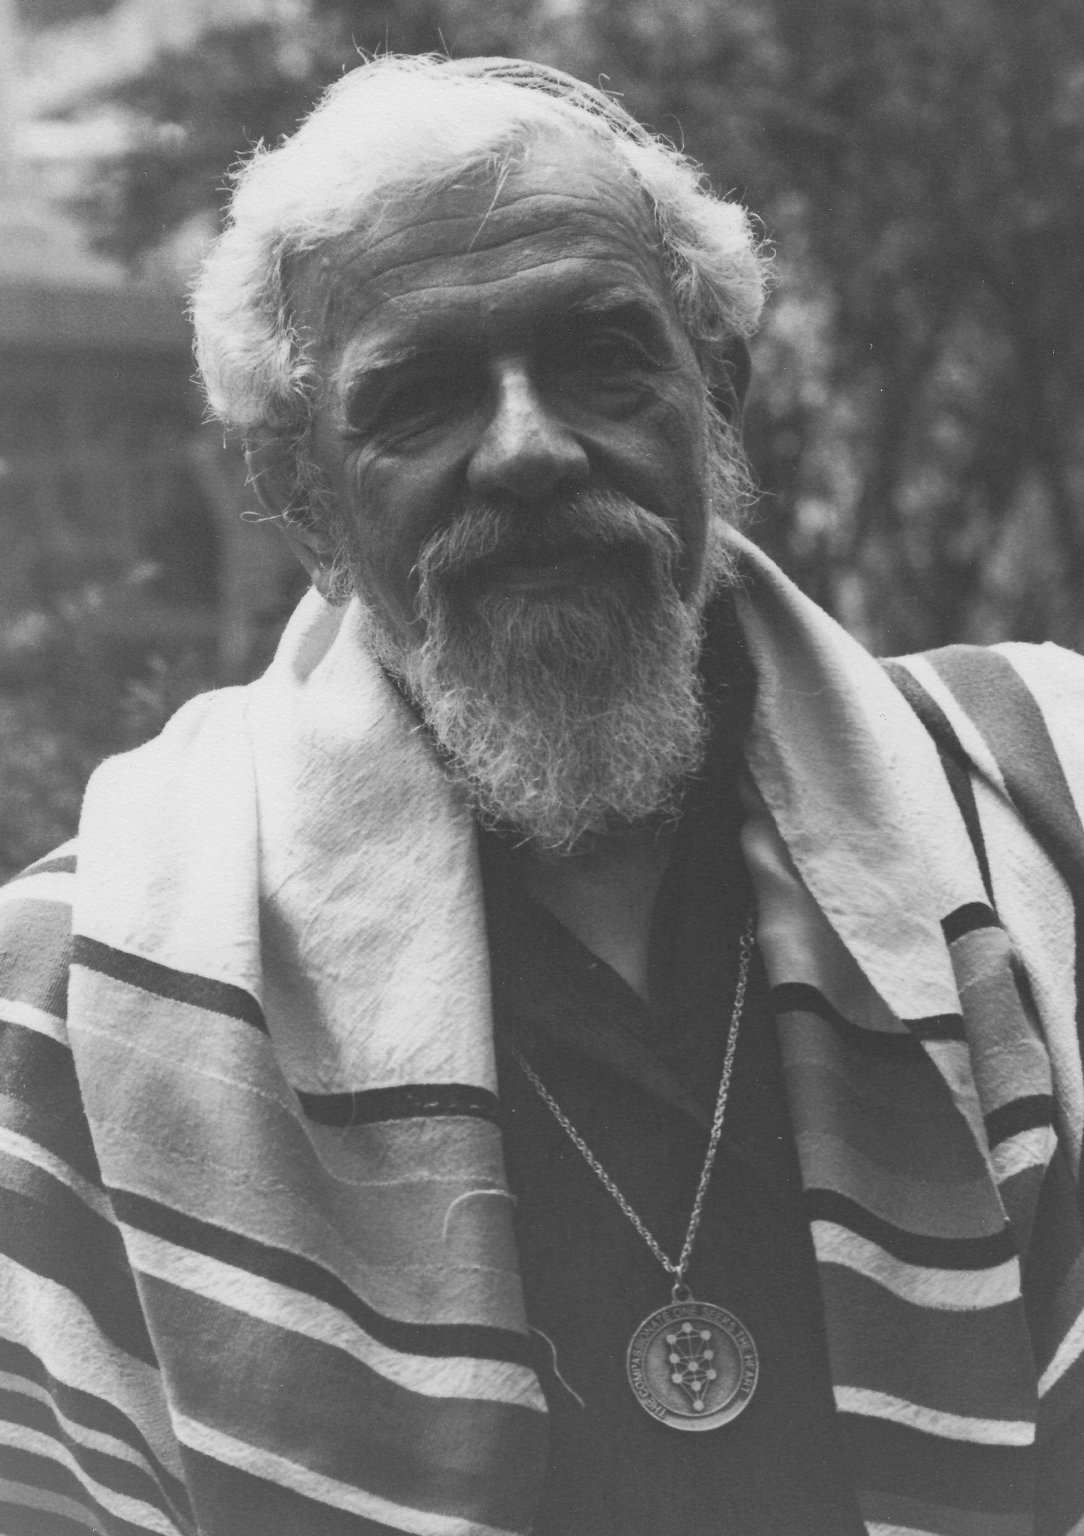 Rabbi Zalman Schachter-Shalomi with tallit and B'nai Or medalion, ca. 1980s.